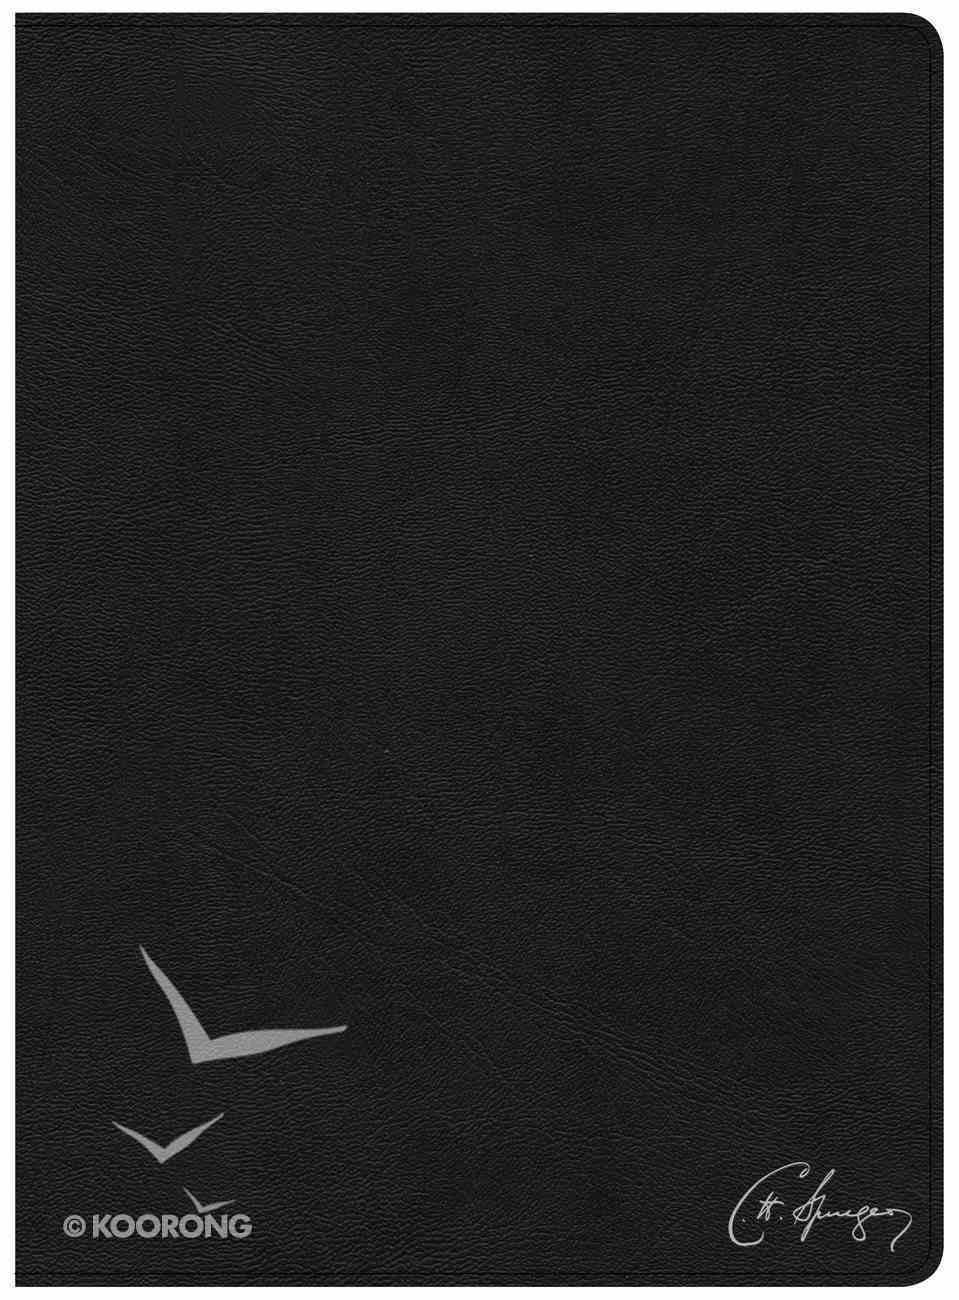 CSB Spurgeon Study Bible Black Genuine Leather